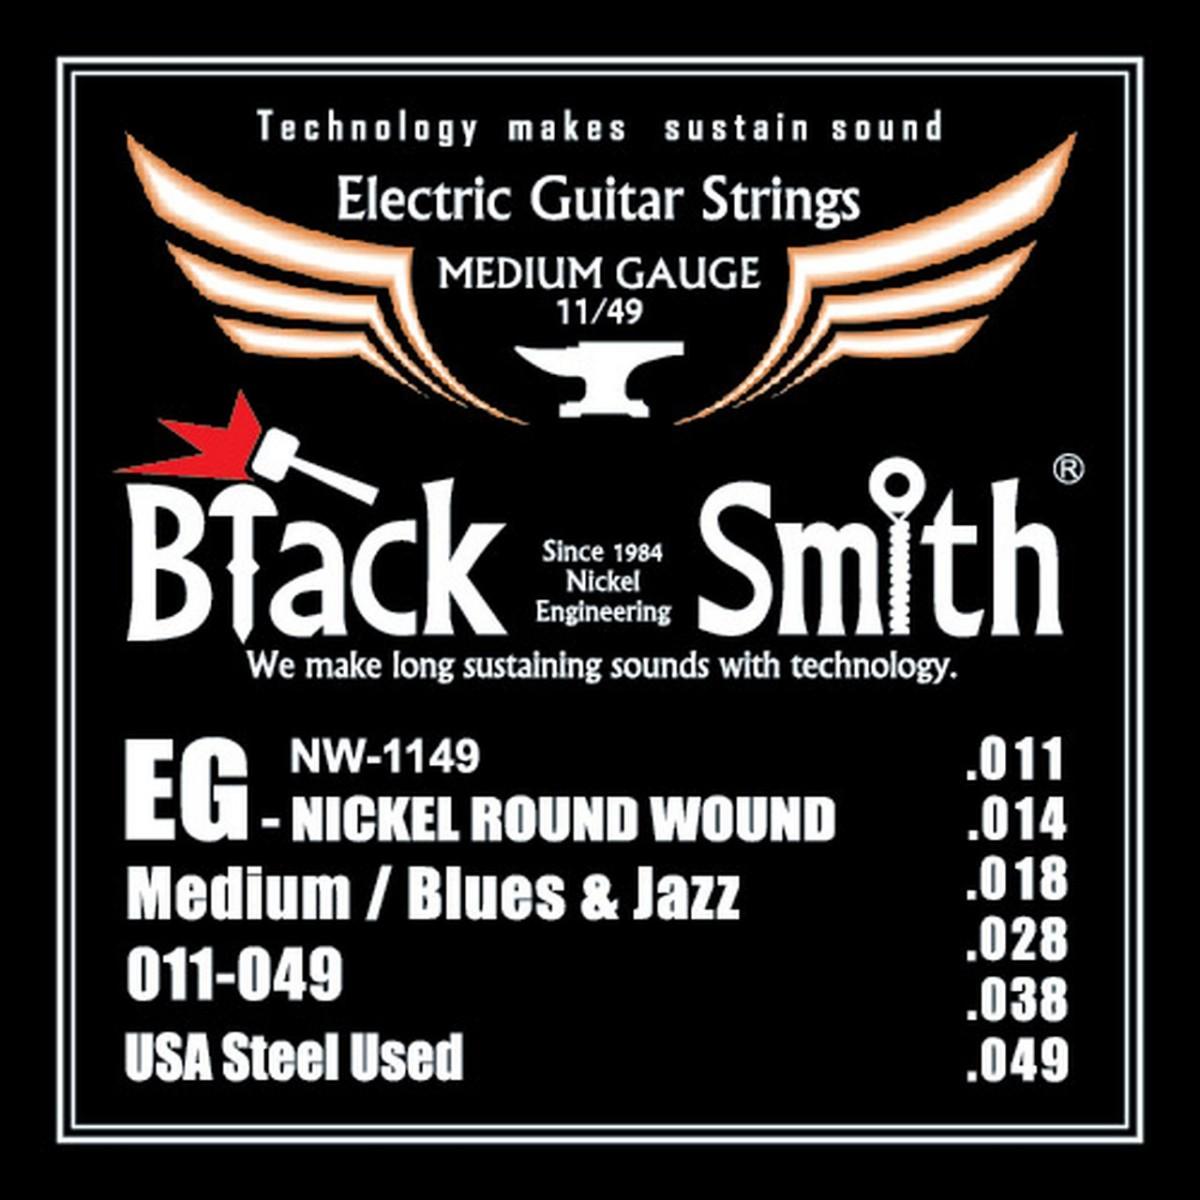 Encordoamento de Guitarra 0.11  Black Smith